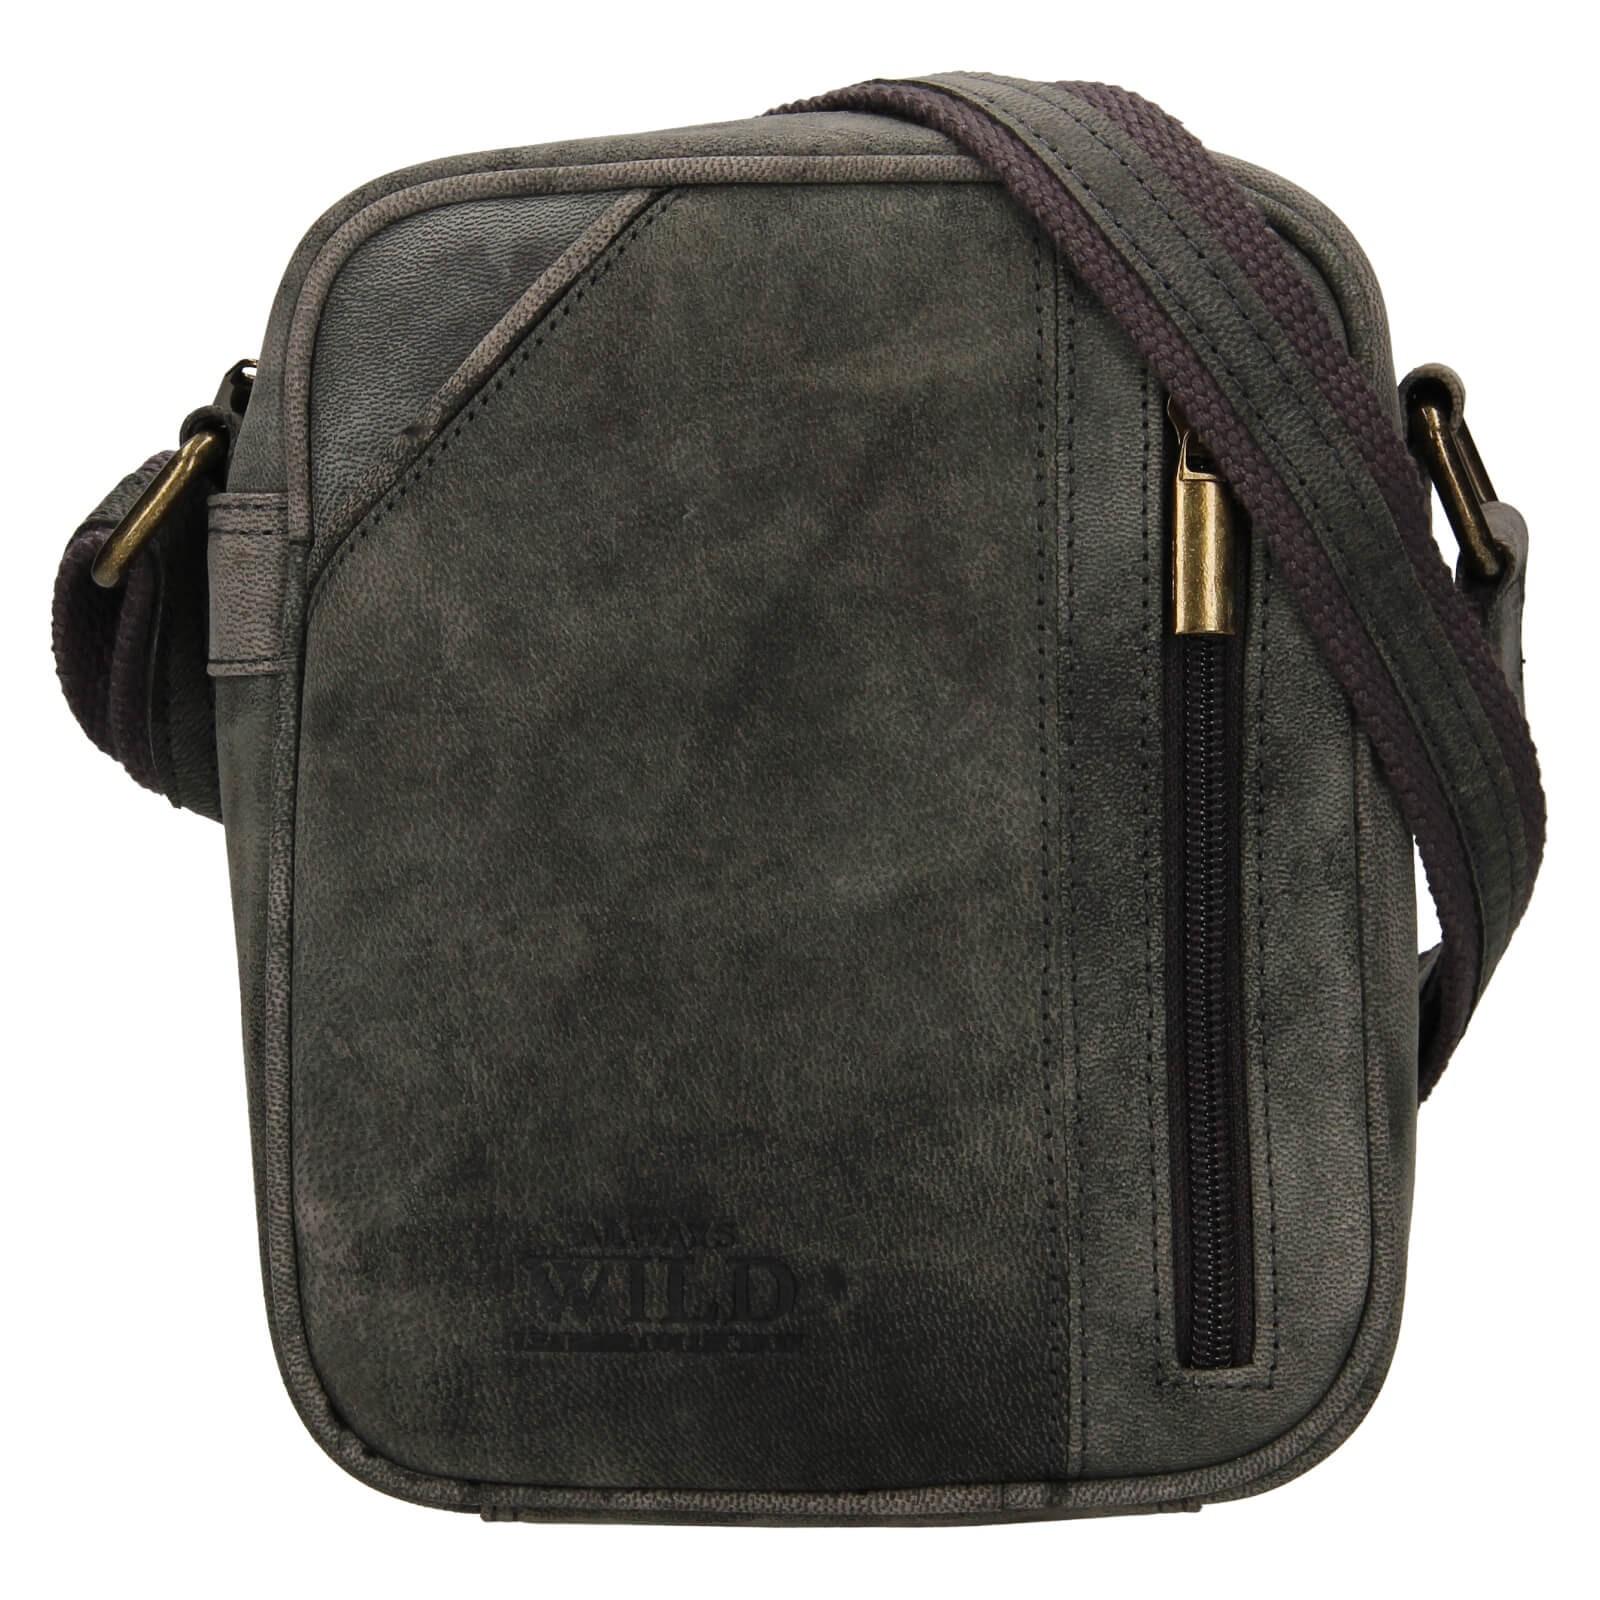 Pánská taška přes rameno Always Wild Merro - čierna